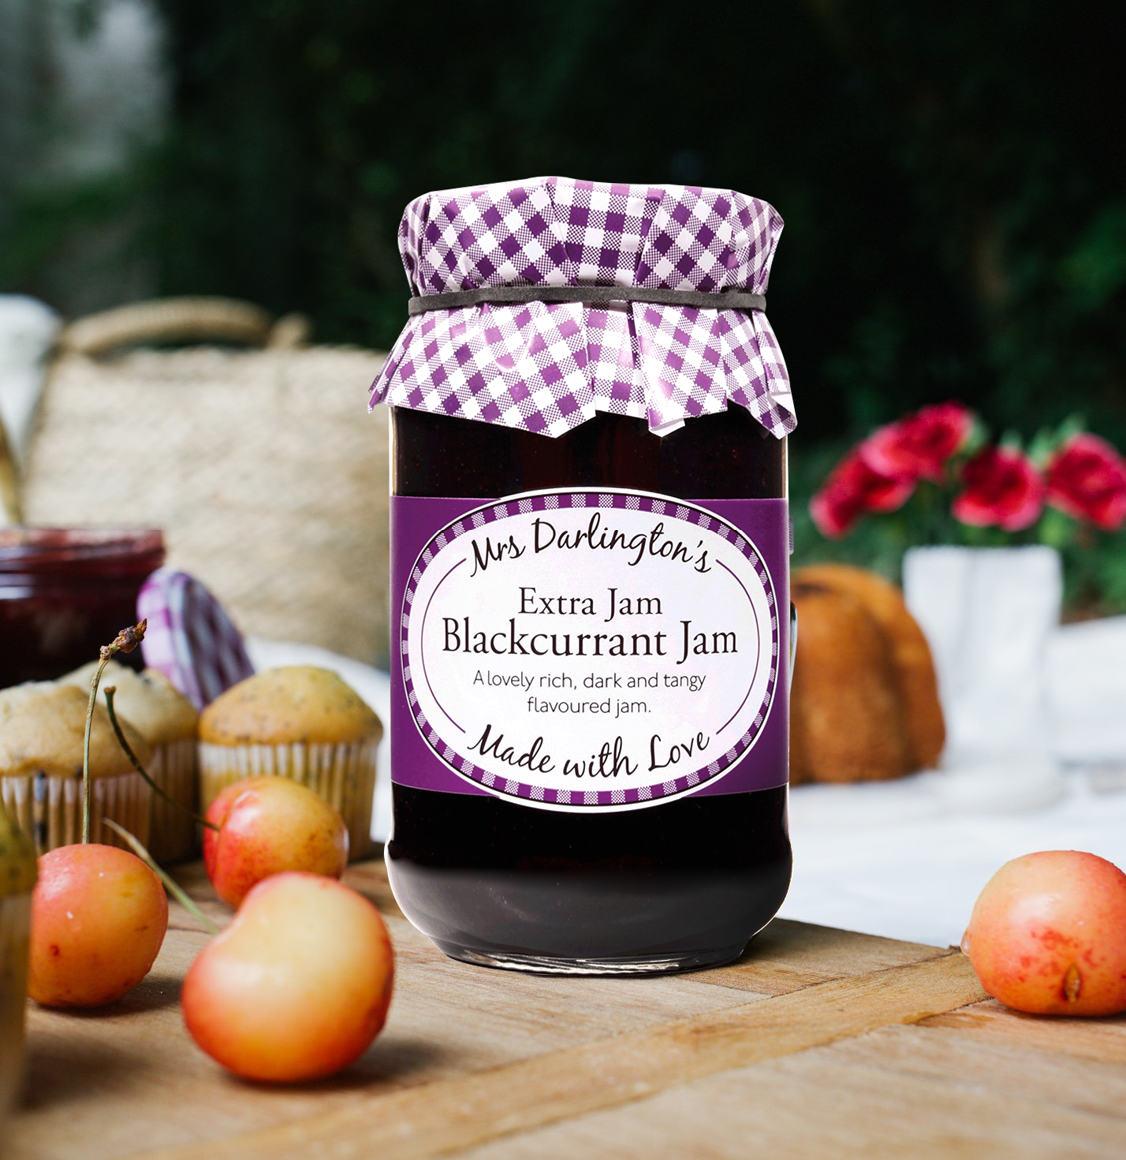 Mrs Darlington's Extra Jam Μαρμελάδα Φραγκοστάφυλου